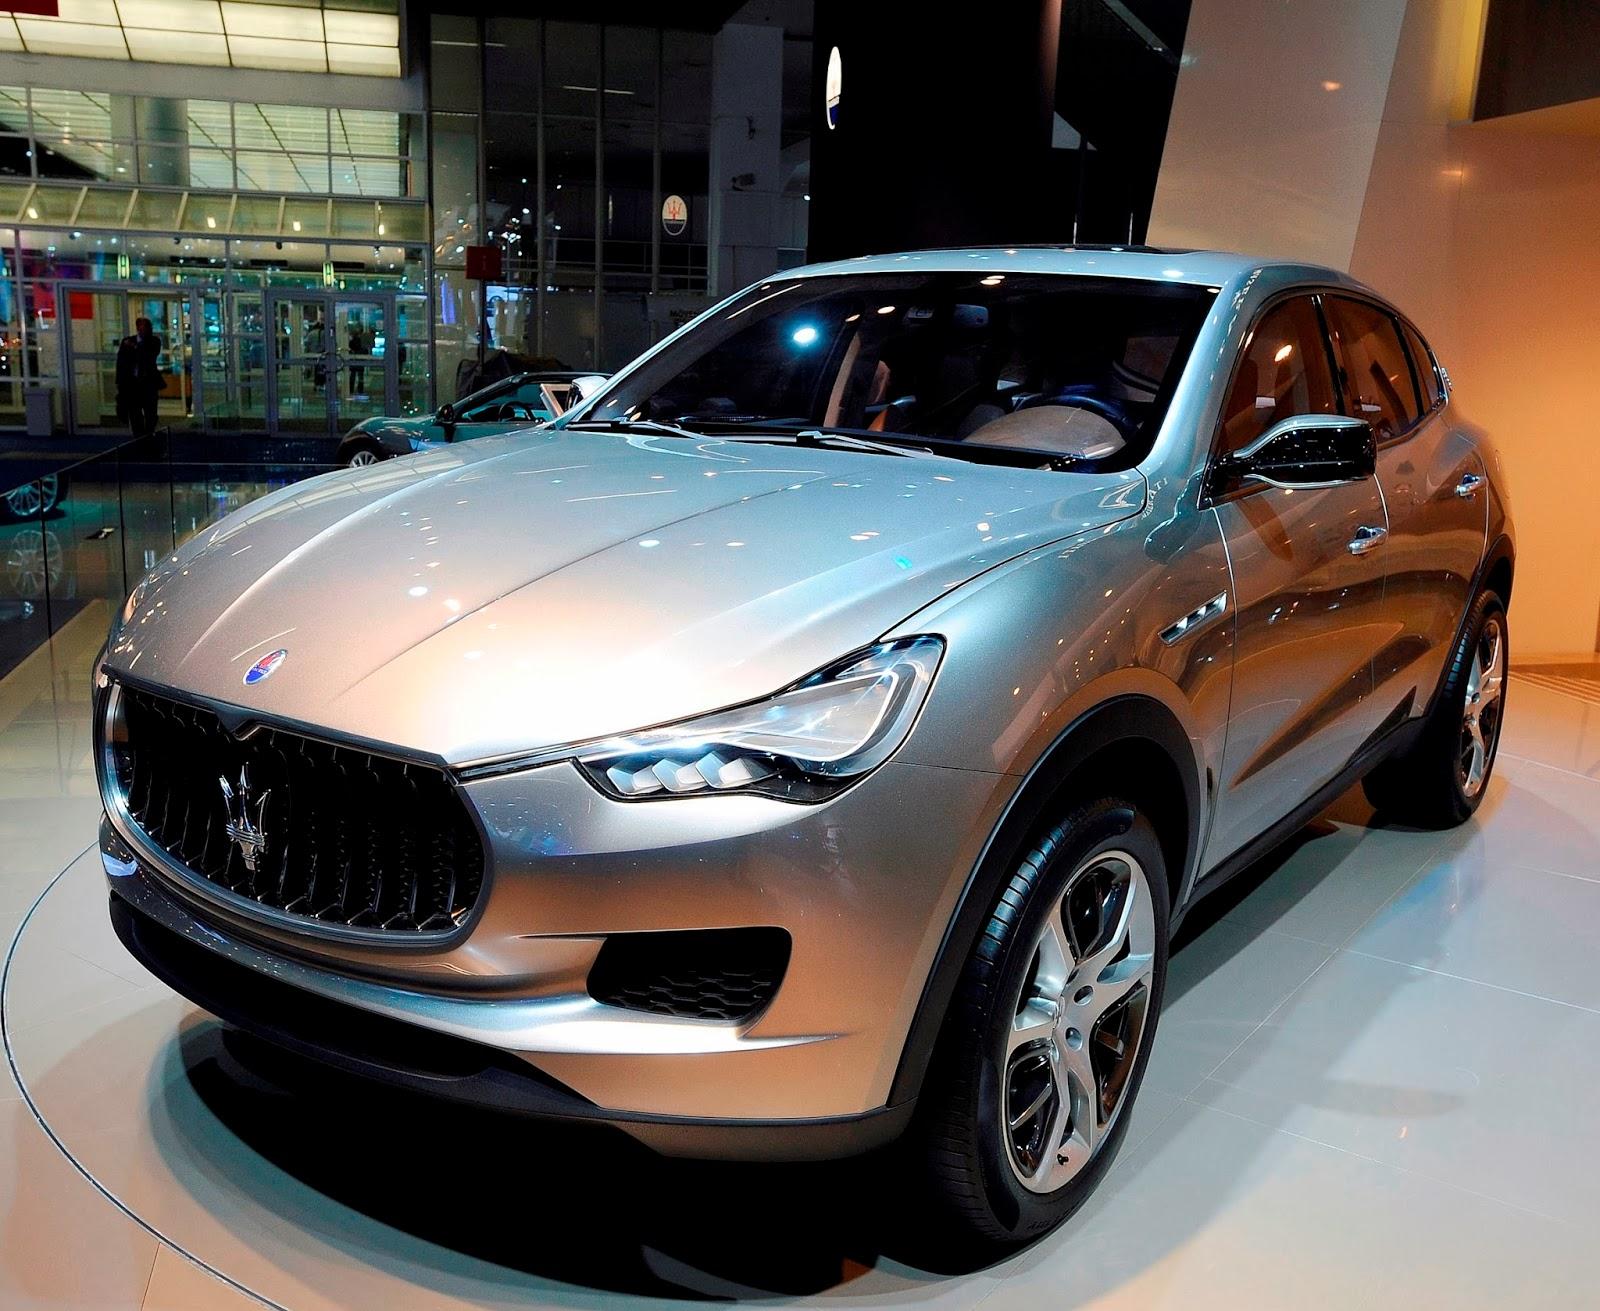 Cars view luxury cars in dubai for Dubai luxury